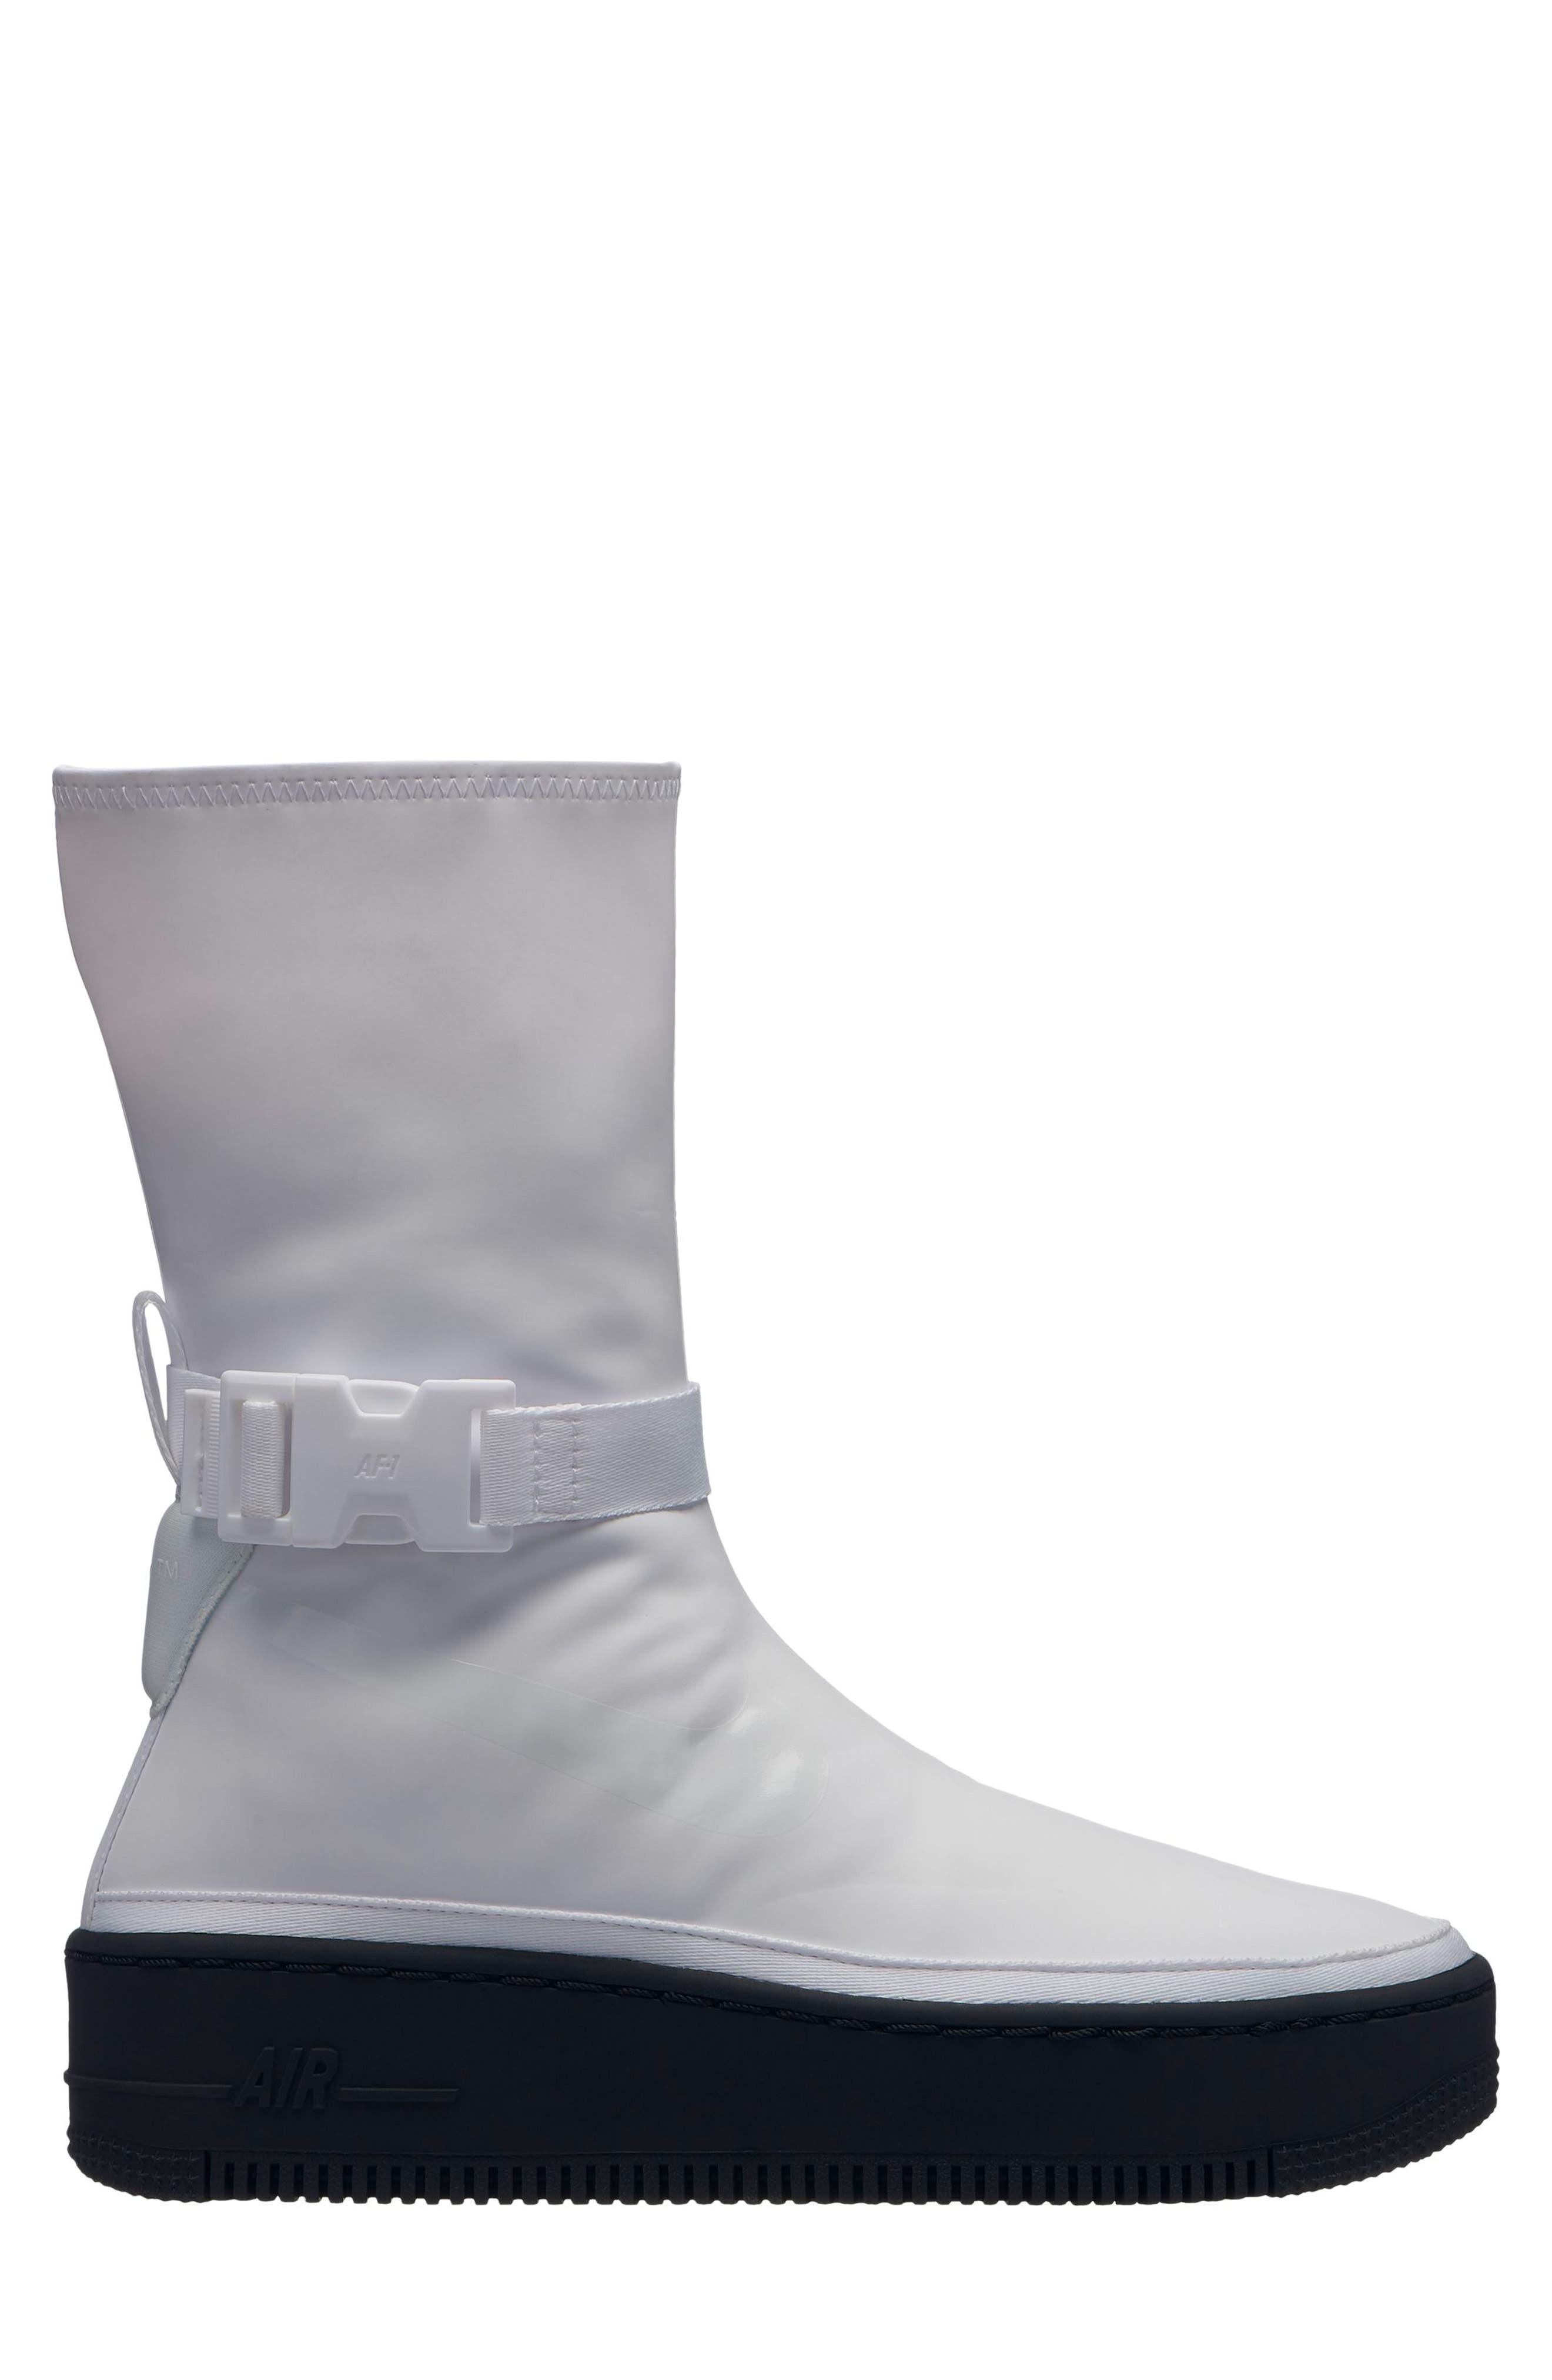 NIKE, Air Force 1 Sage High Platform Sneaker, Main thumbnail 1, color, WHITE/ WHITE/ BLACK